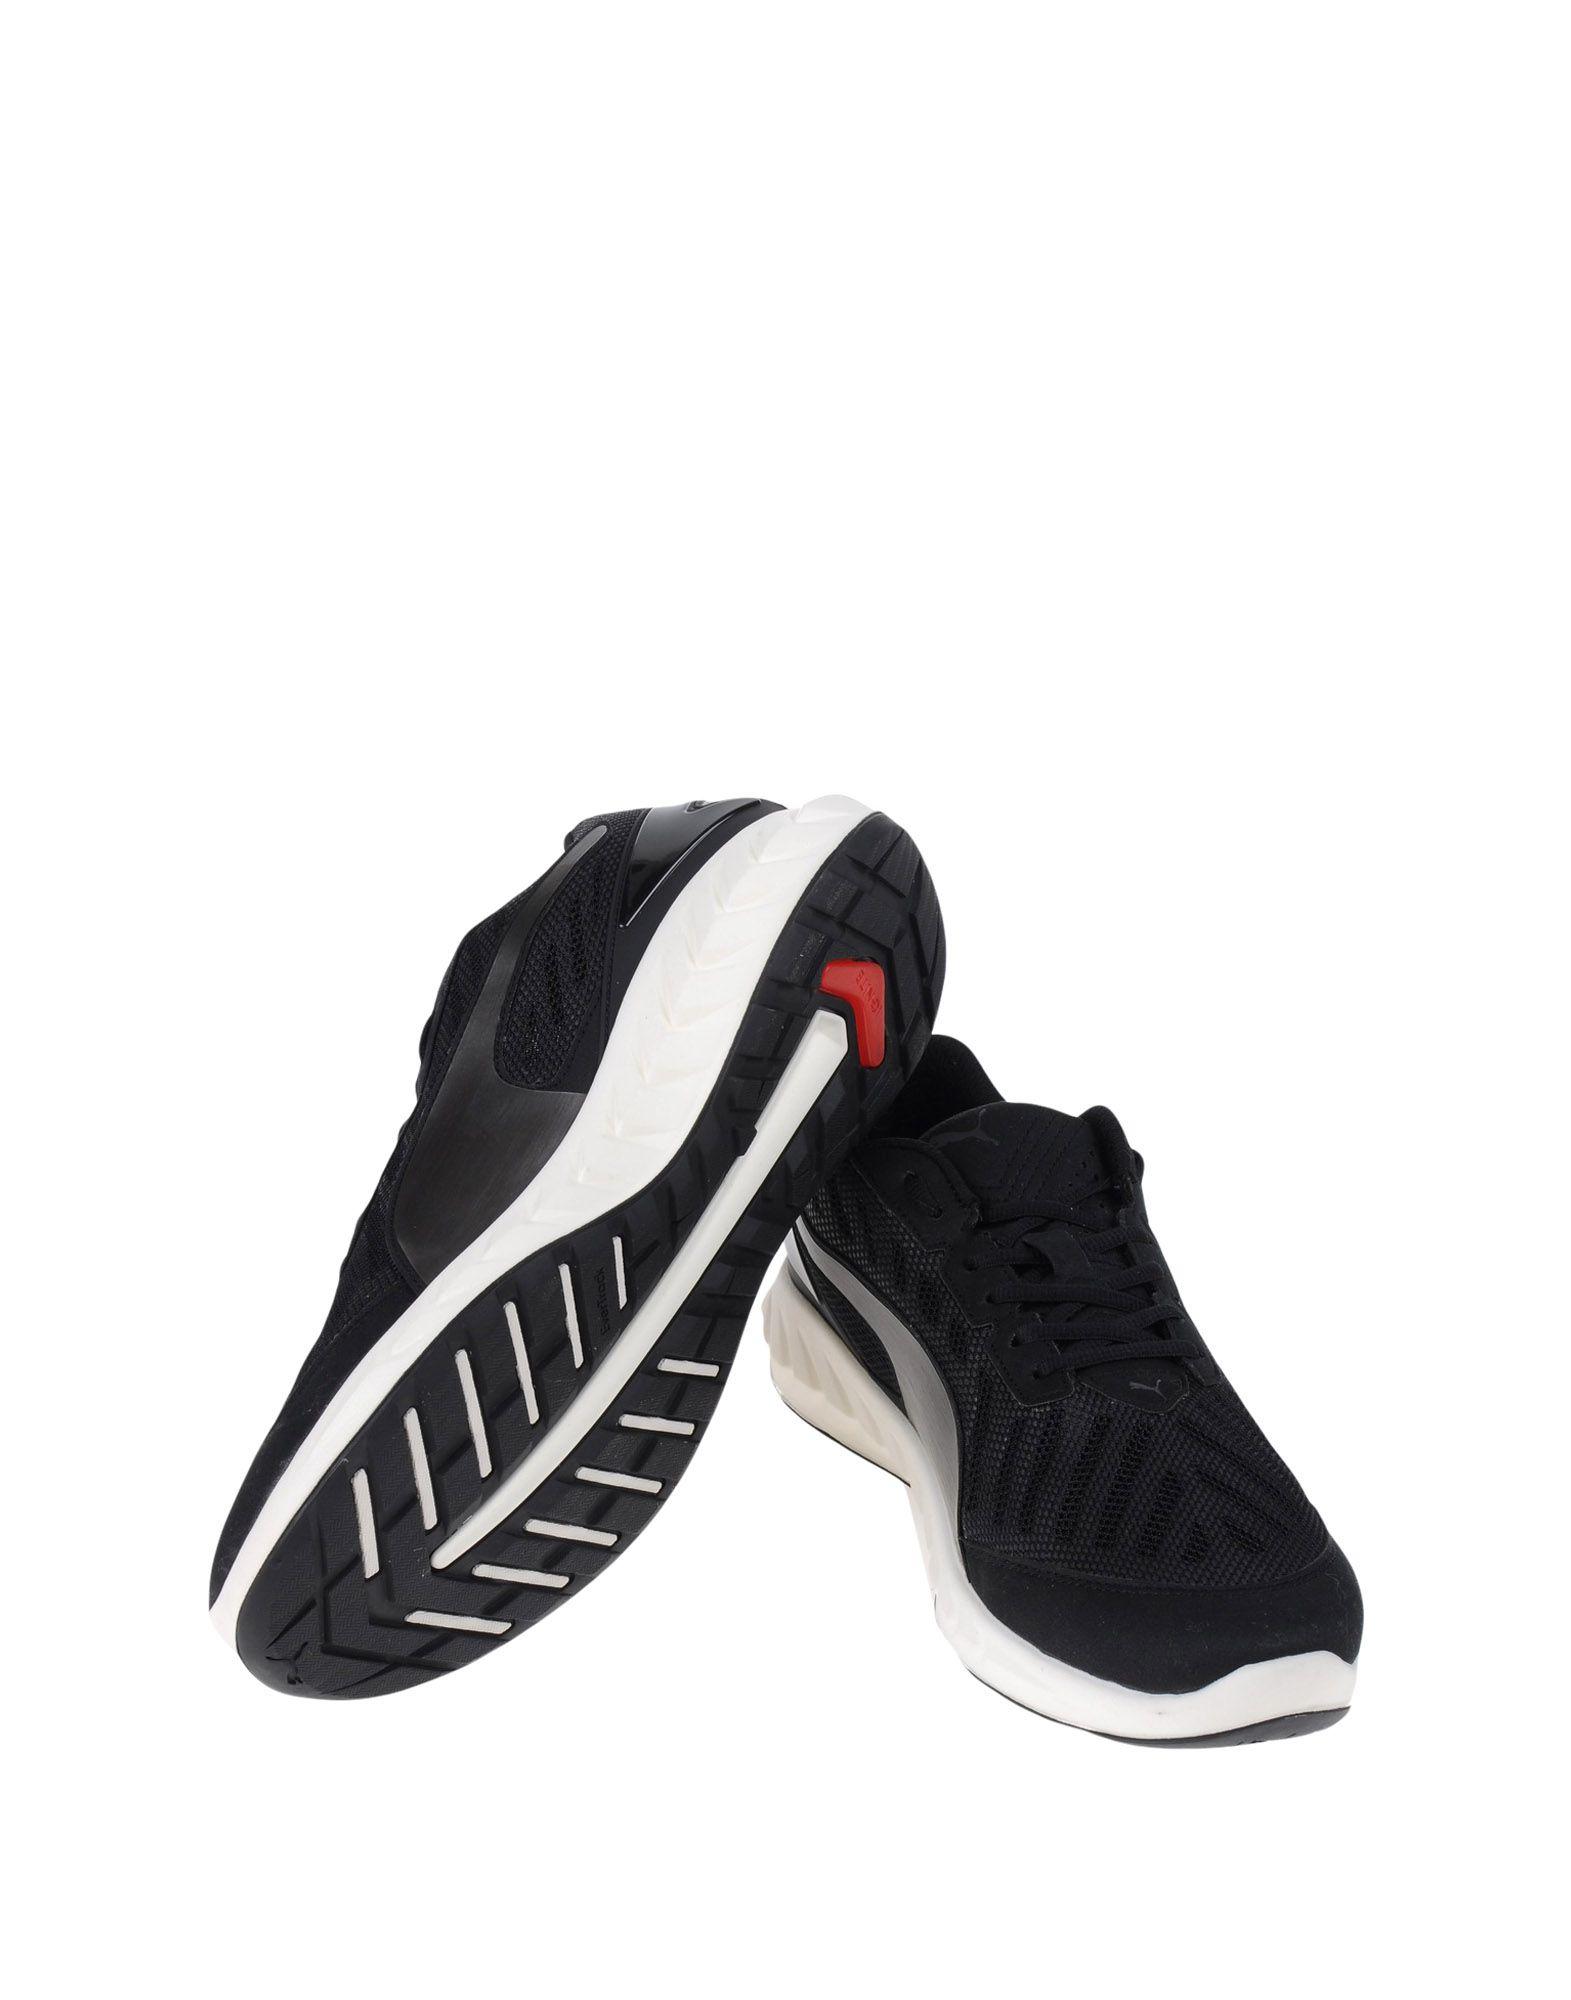 Sneakers Puma 188605-Ignite Ultimate - Homme - Sneakers Puma sur